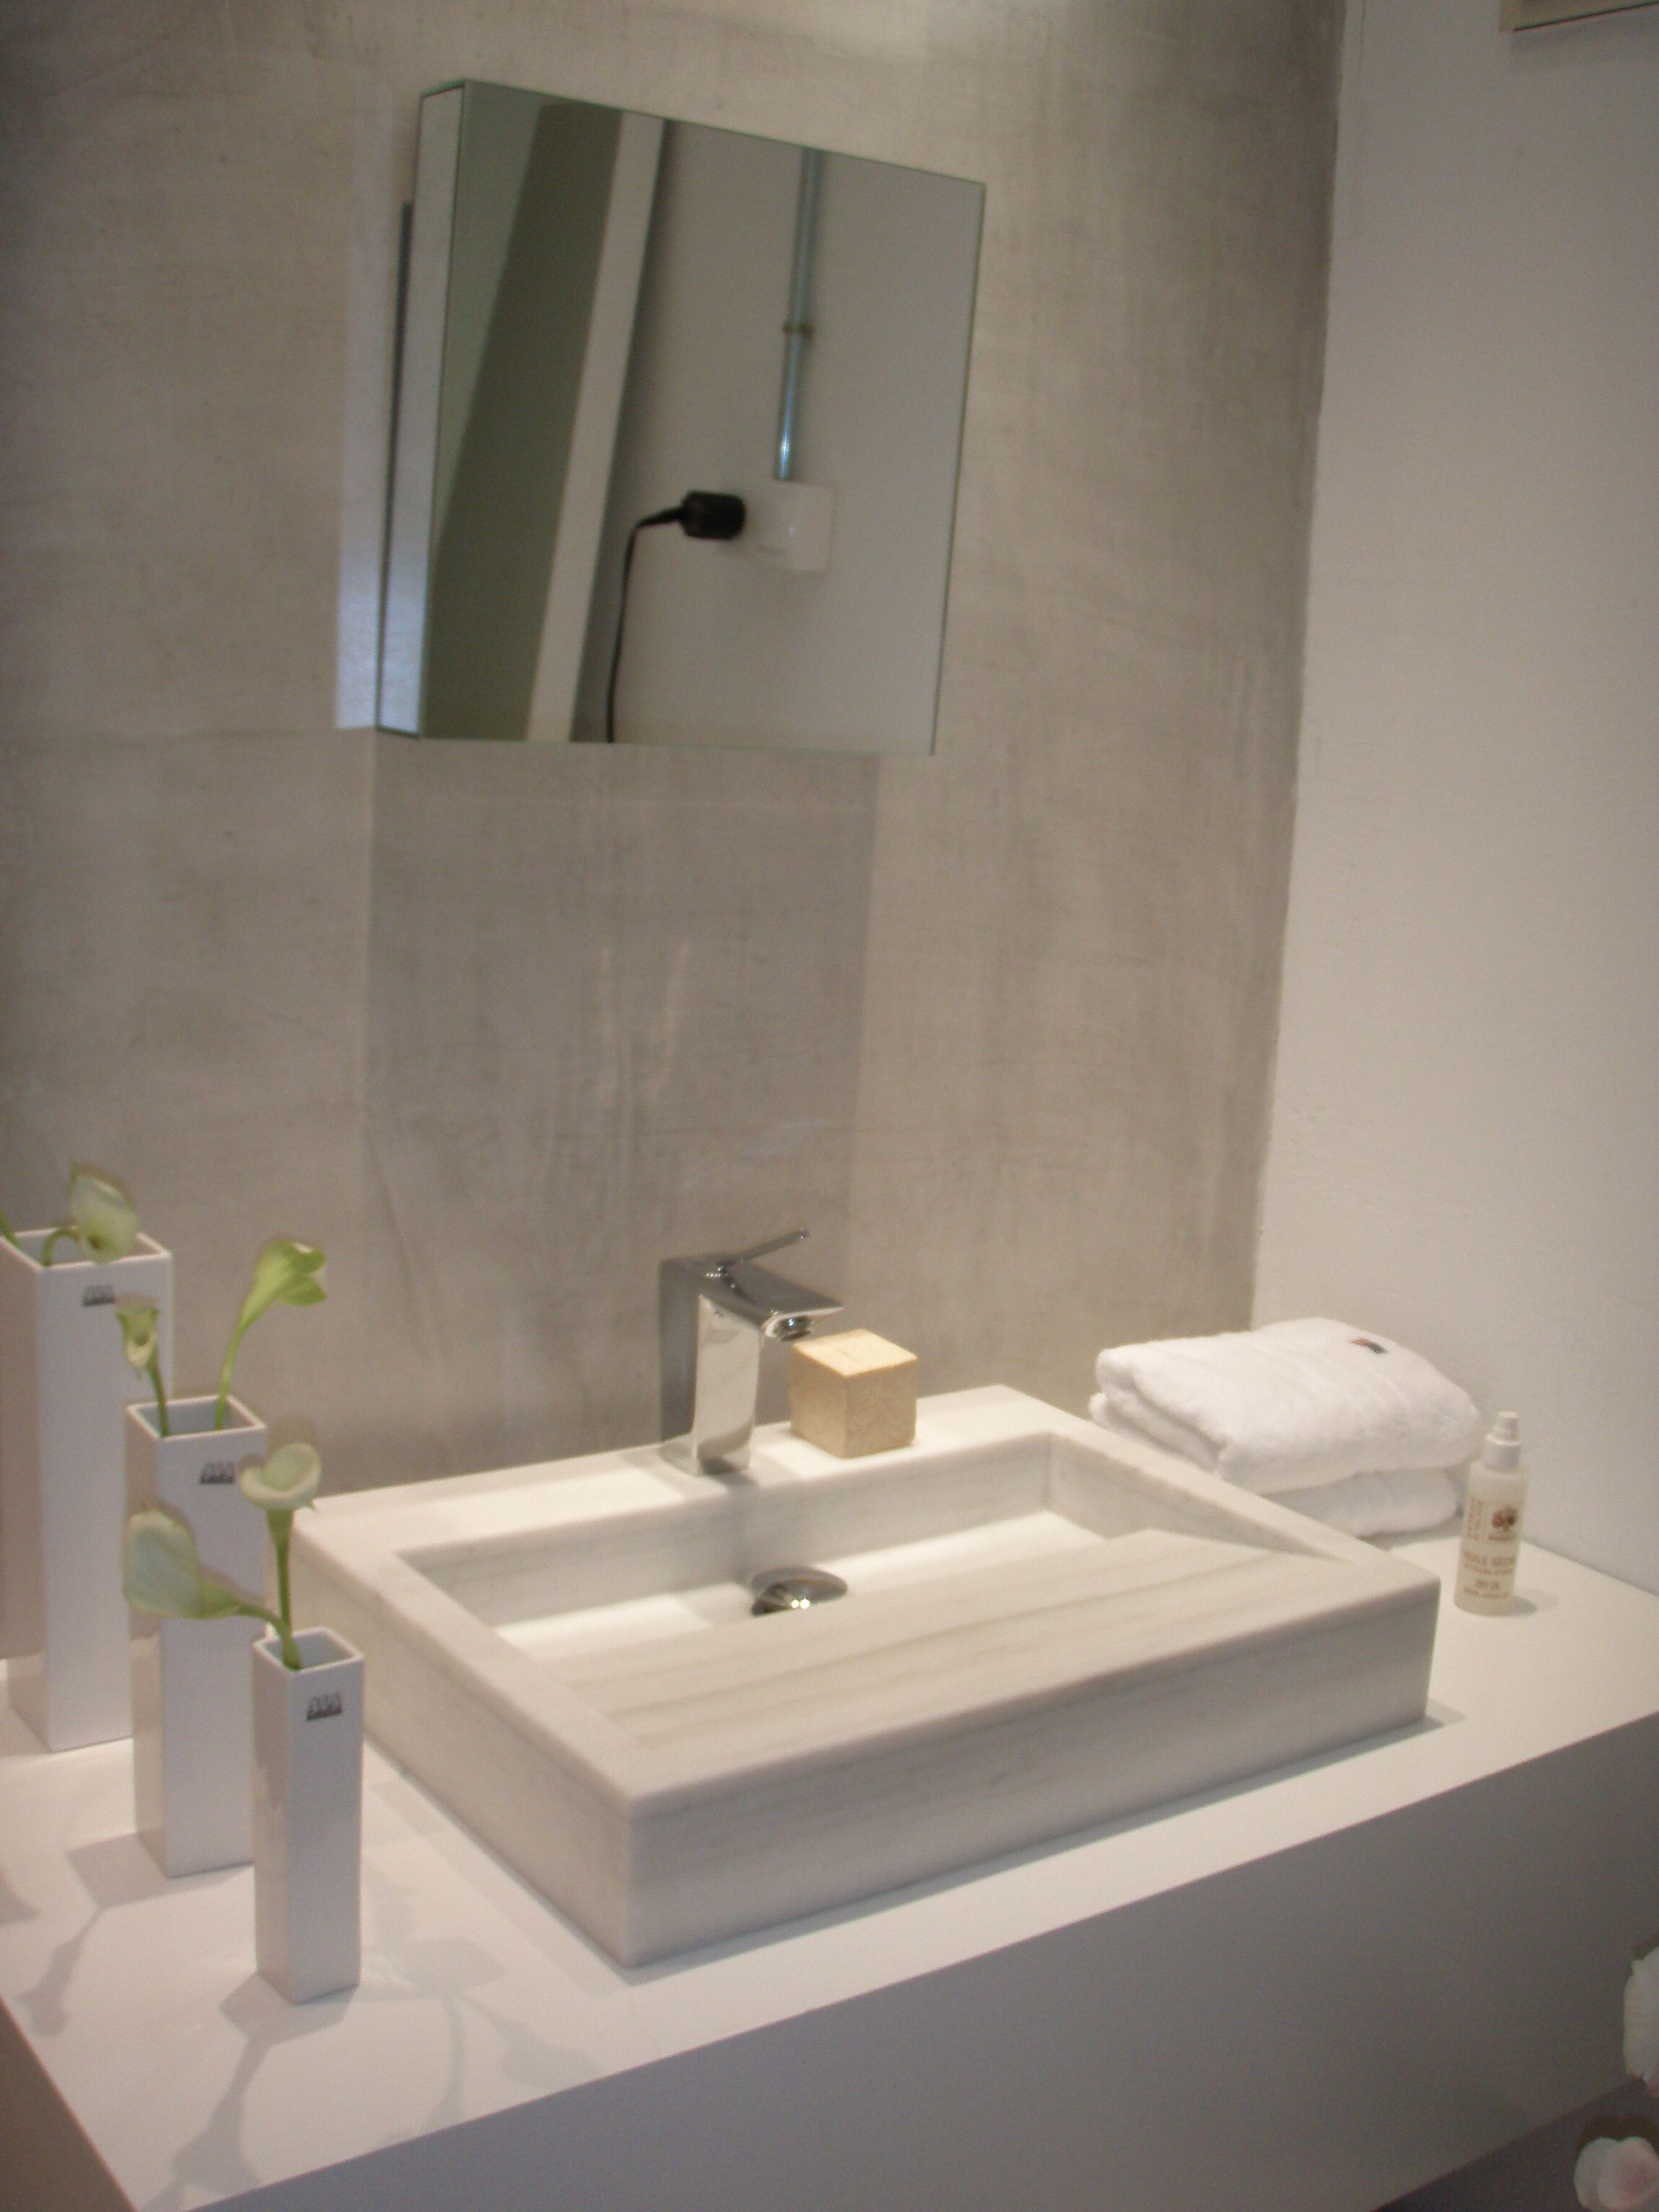 Lavabo macizo de marmol blanco macael decoraci n ba os - Losas de bano ...